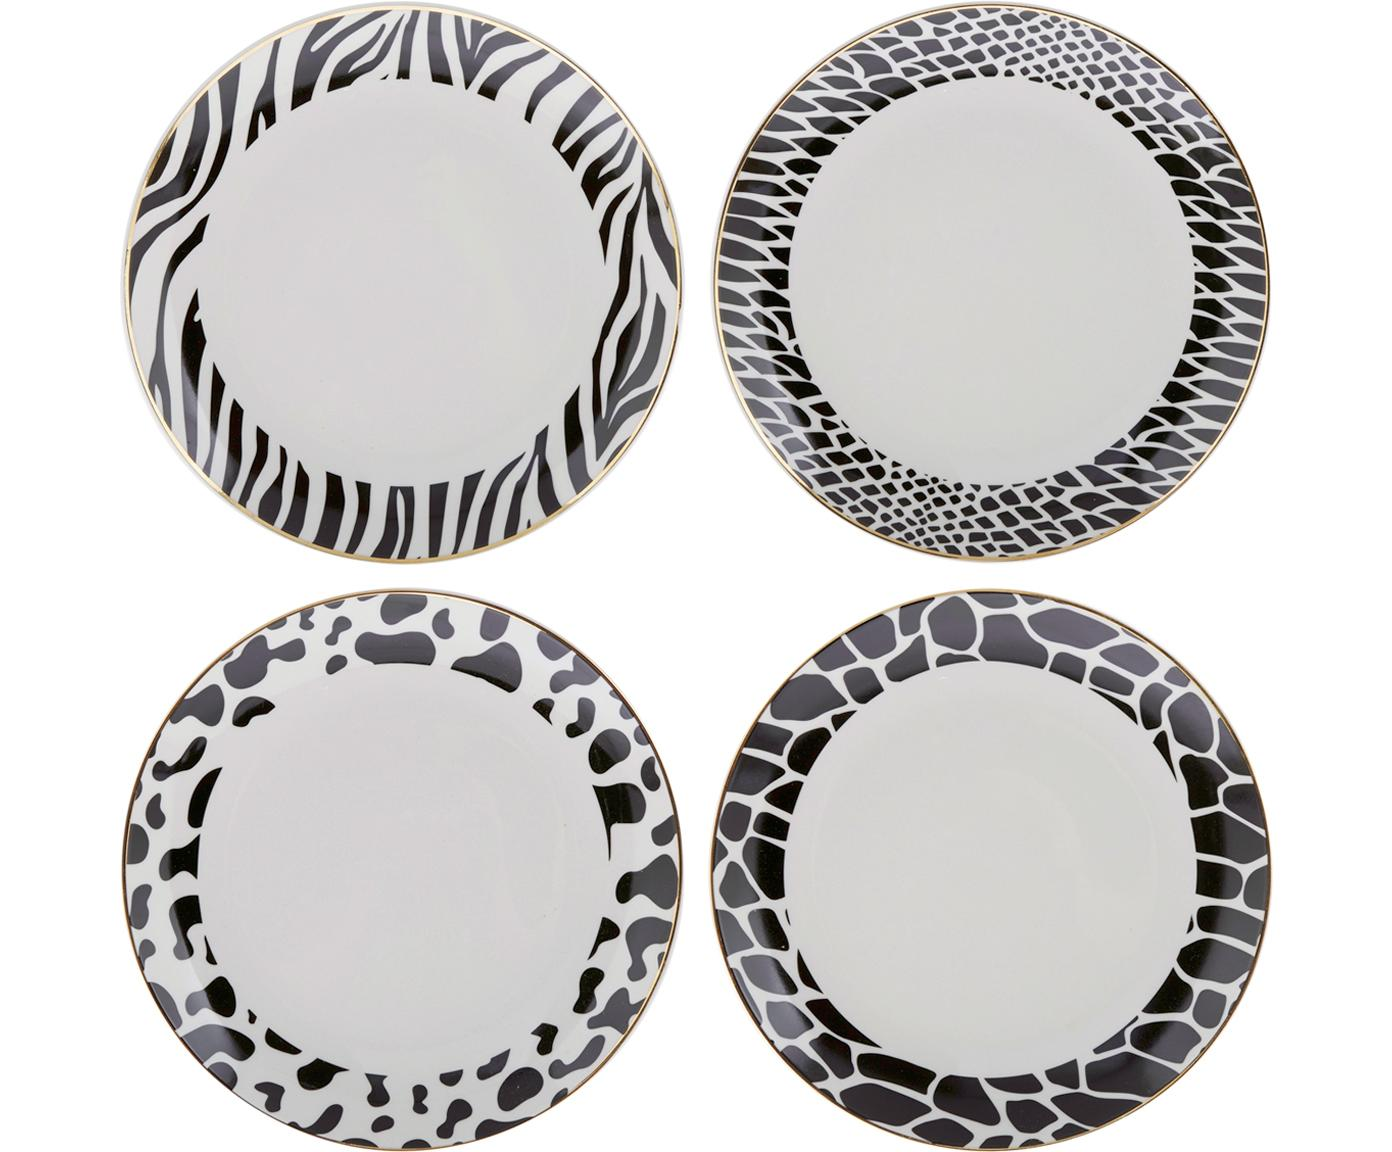 Set de platos de postre Wild Jungle, 4pzas., Porcelana, Blanco con manchas negras, Ø 19 cm